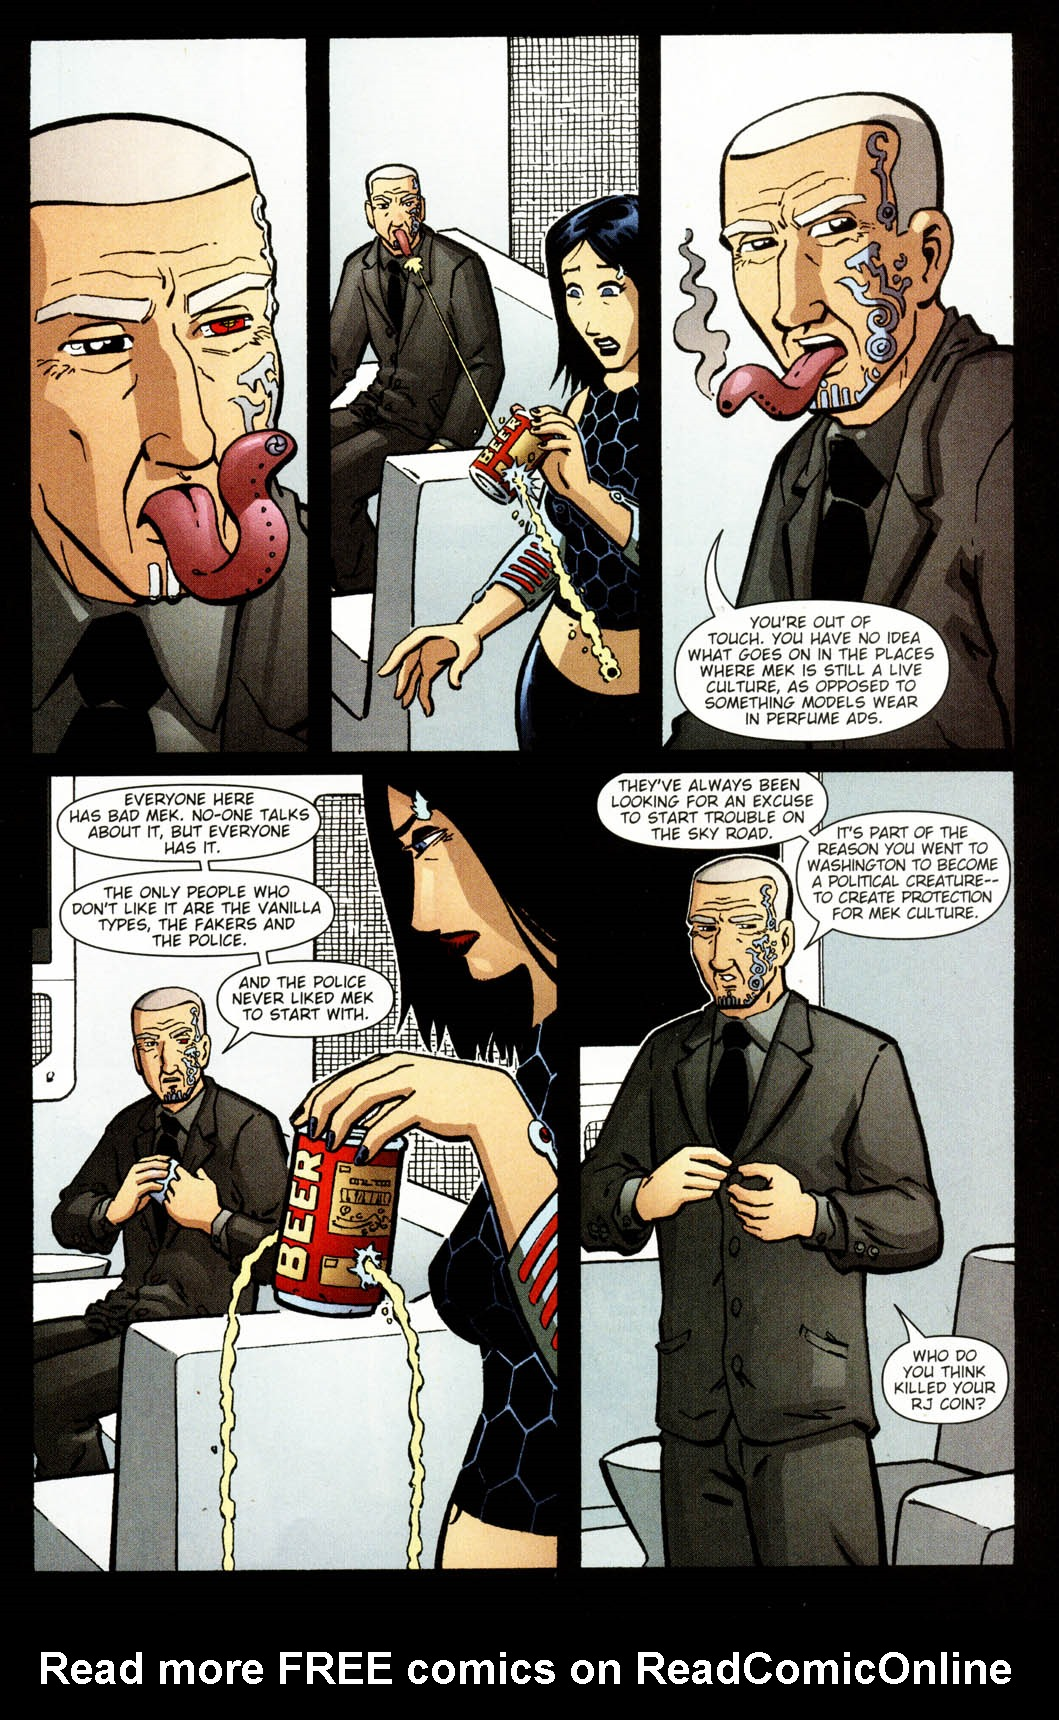 Read online Mek comic -  Issue #2 - 18